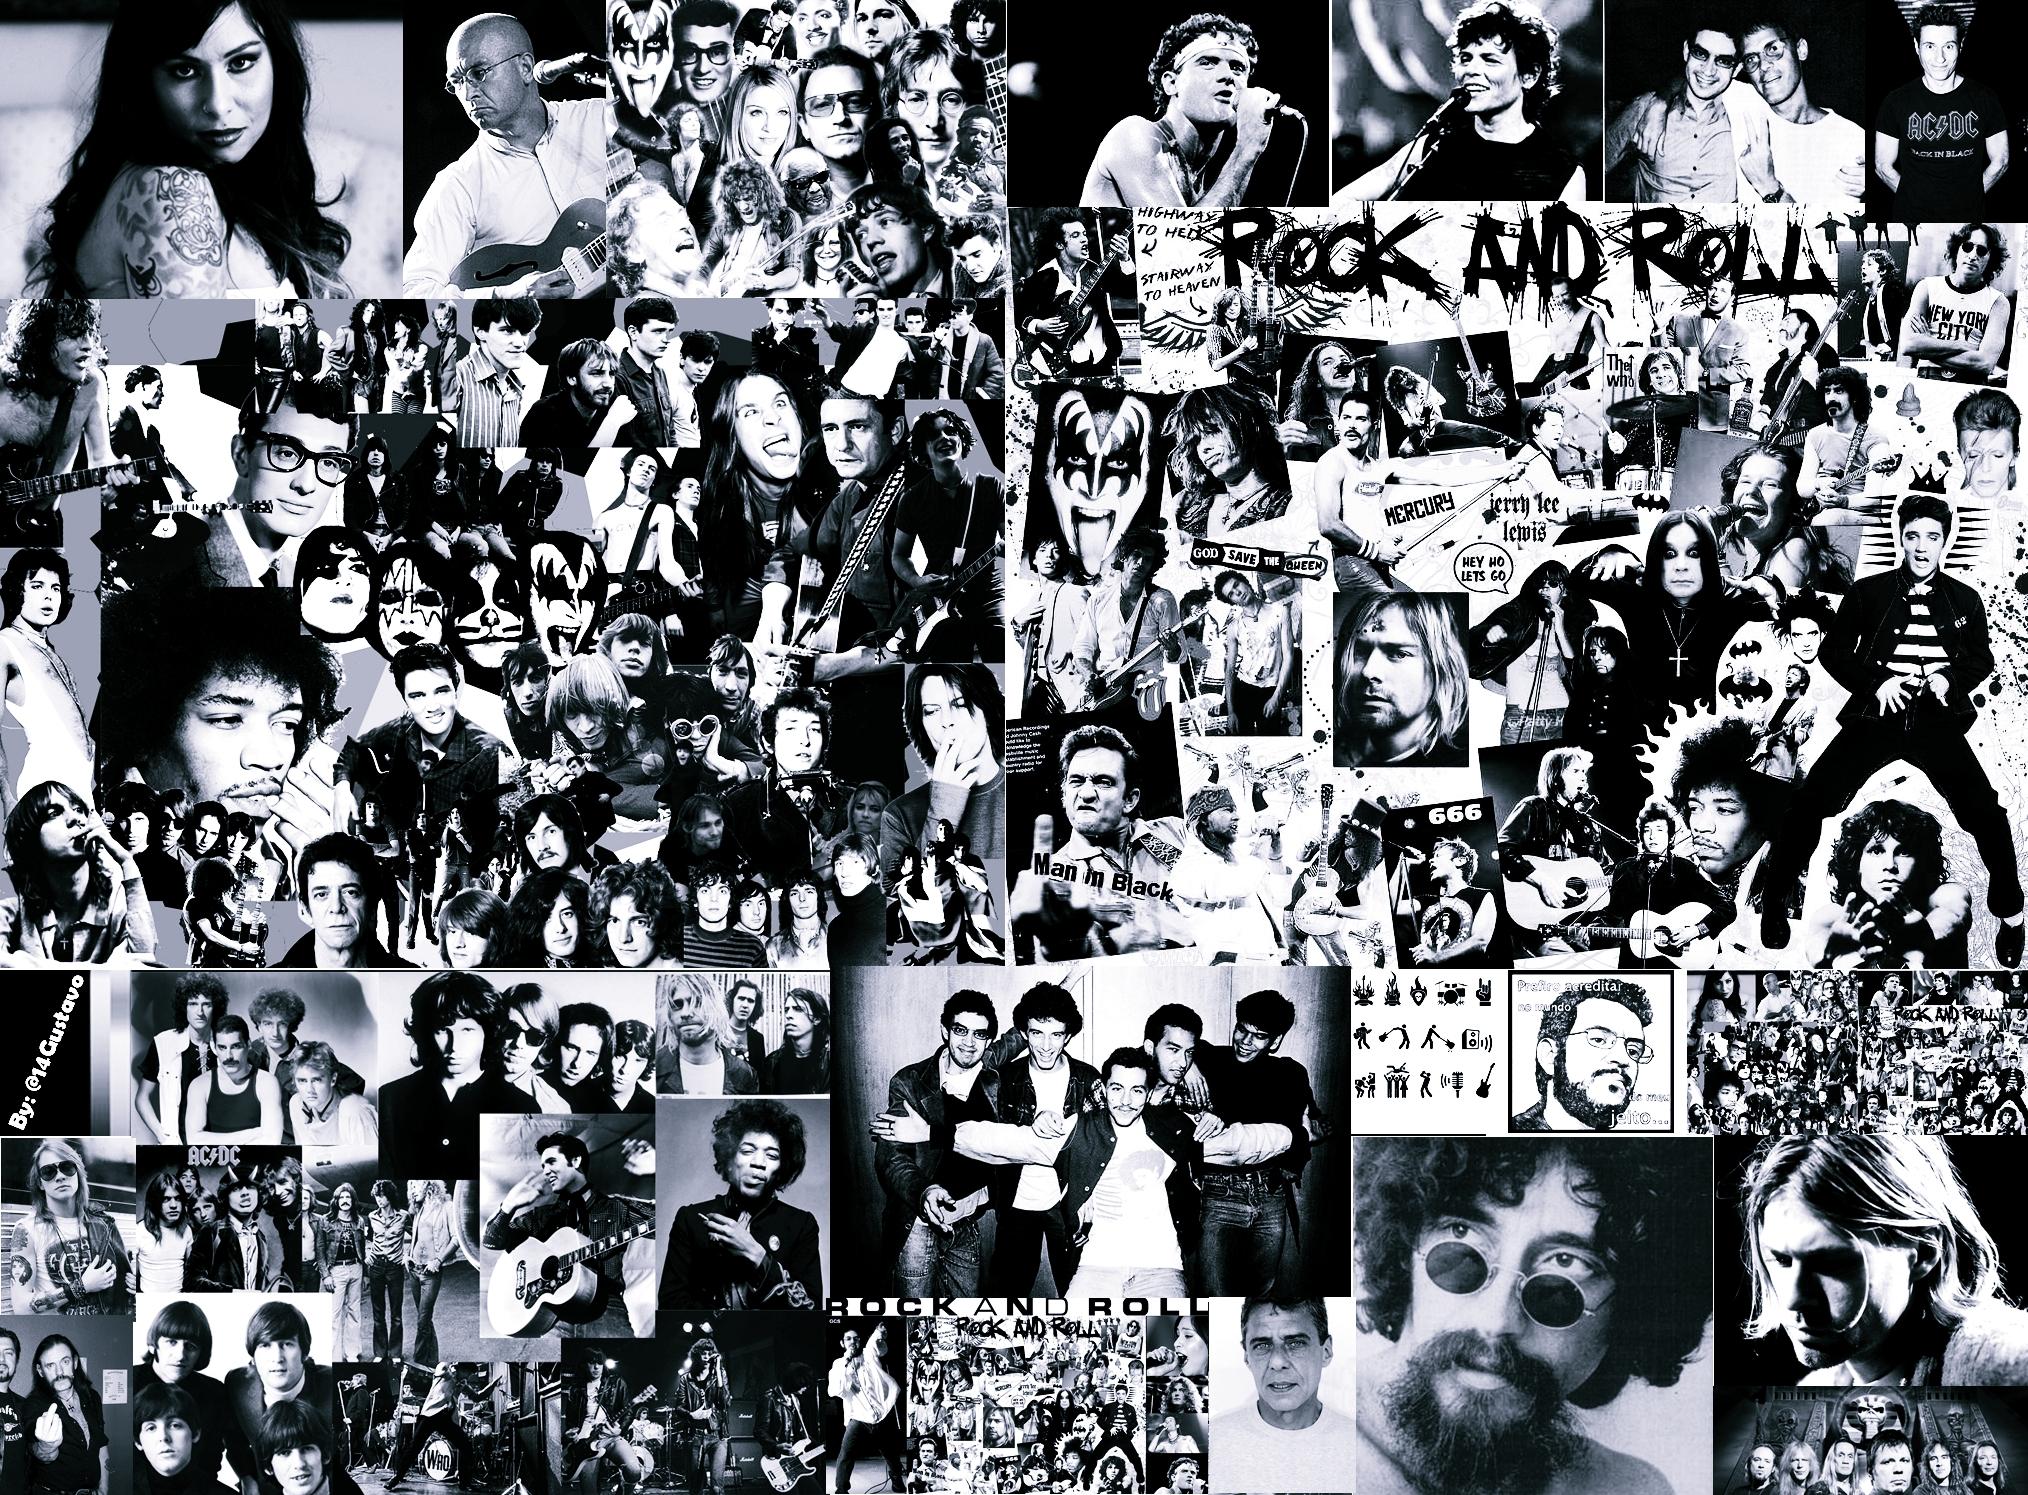 Rock and Roll wallpaper   ForWallpapercom 2028x1495